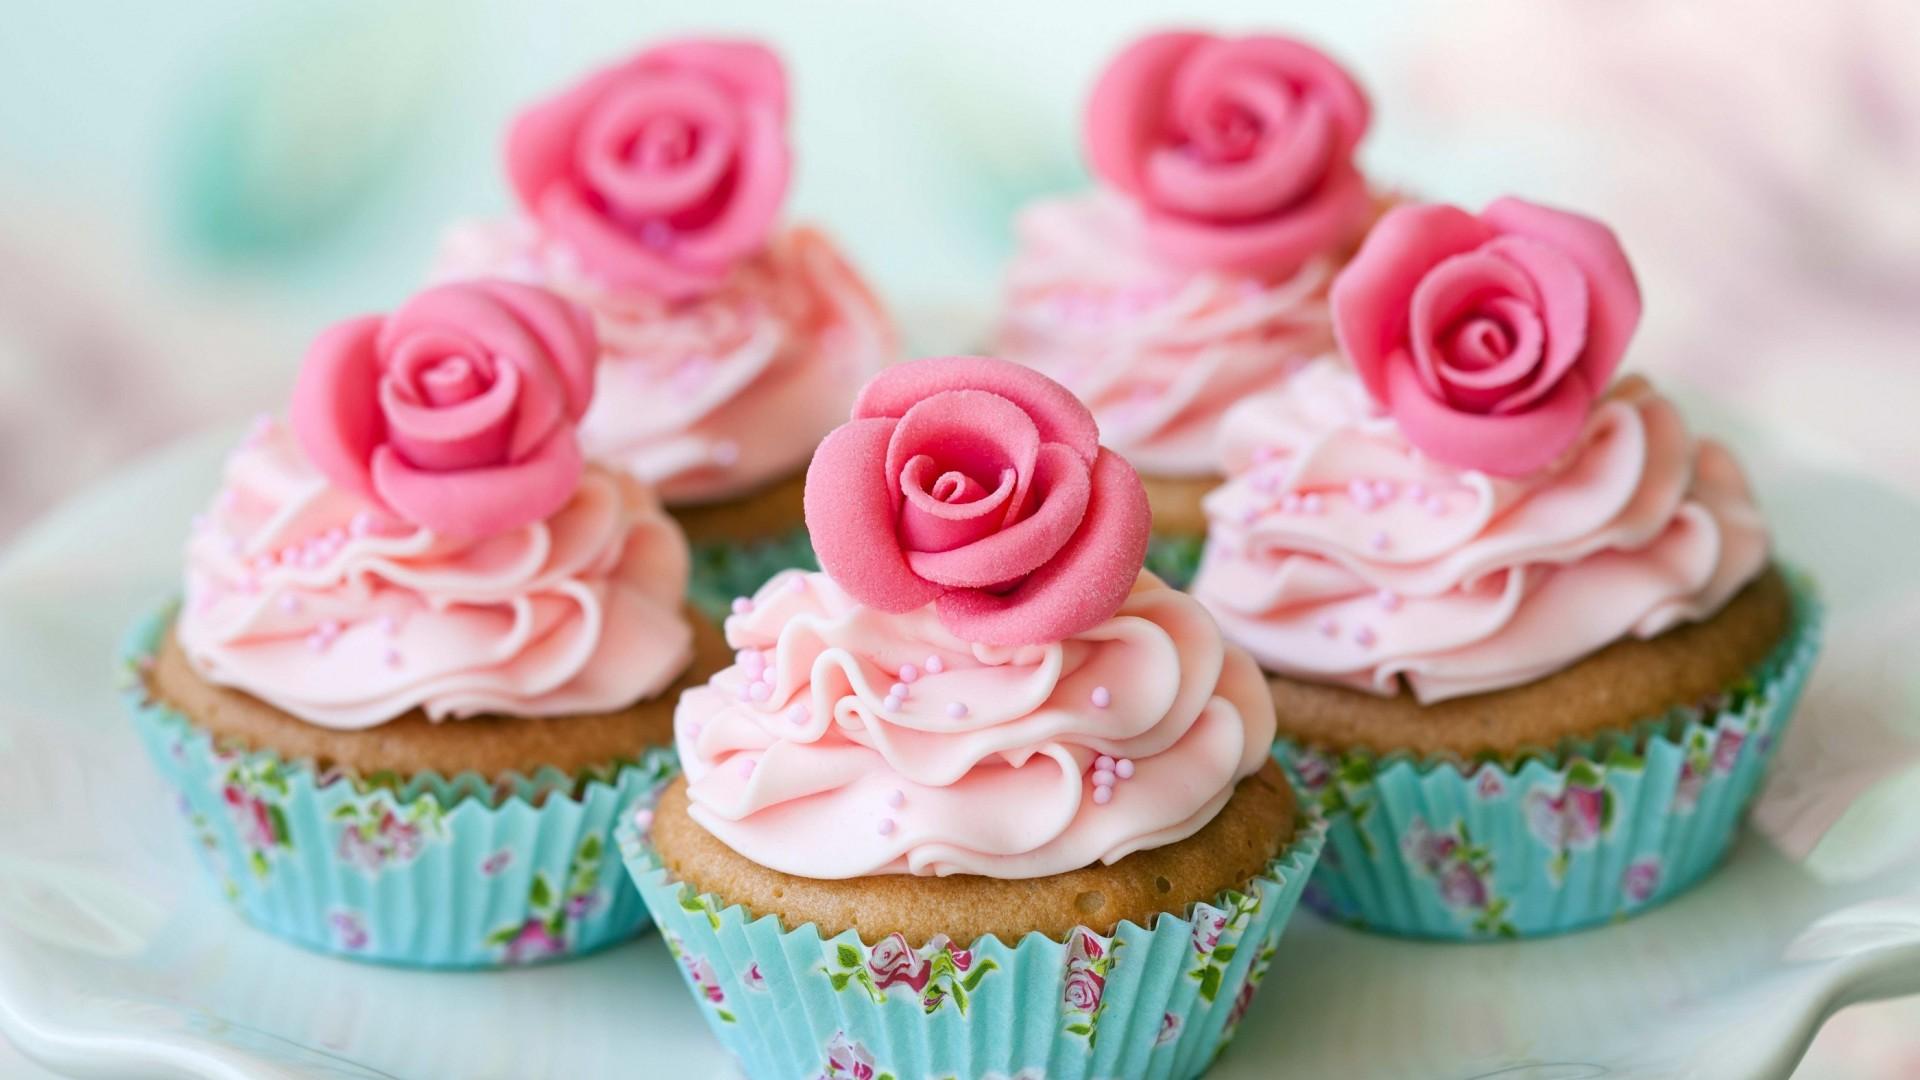 cute pastries wallpaper 40233